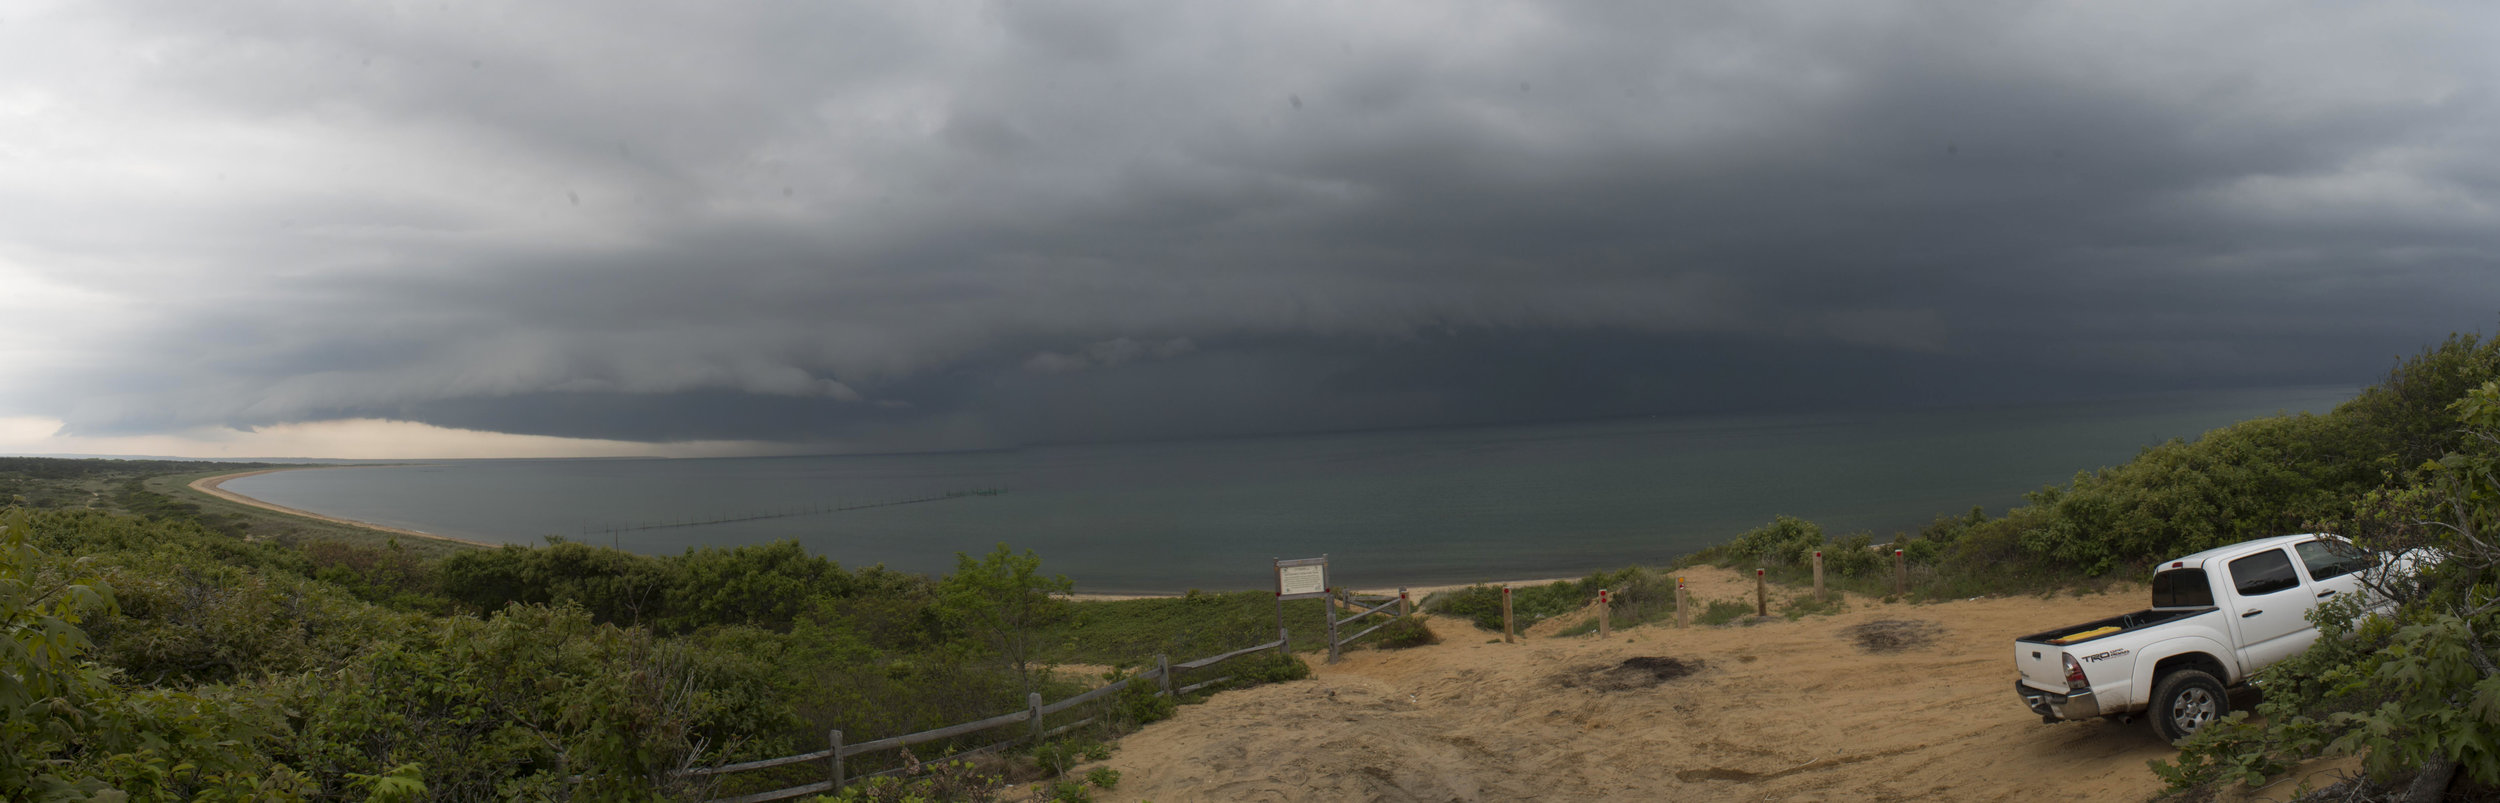 stormNorth.jpg